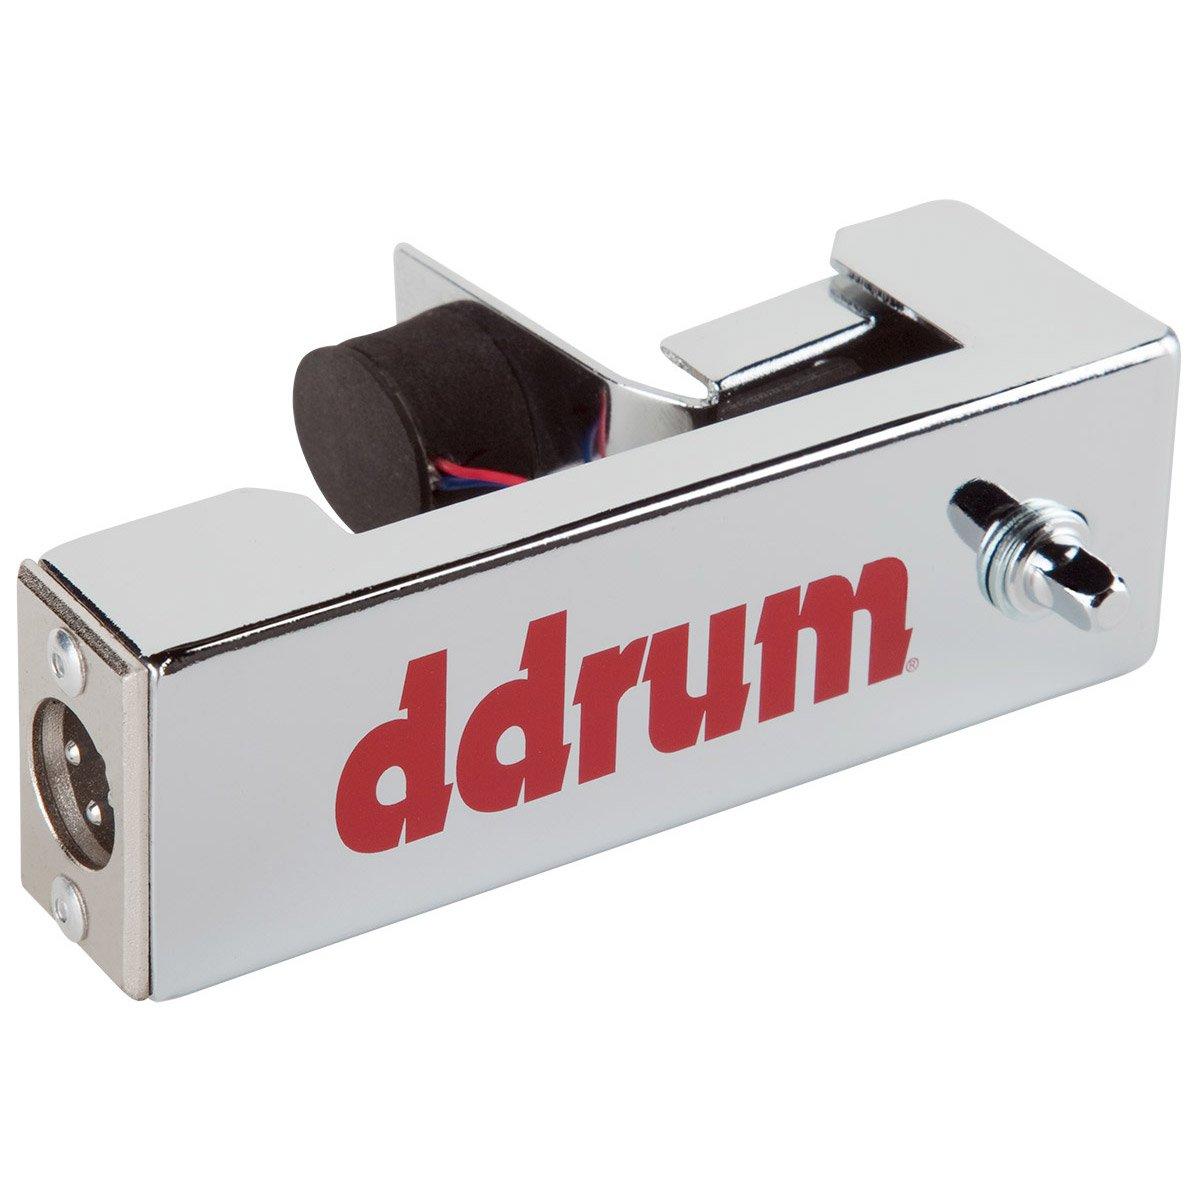 ddrum CETK Chrome Elite Bass Drum Trigger by Ddrum